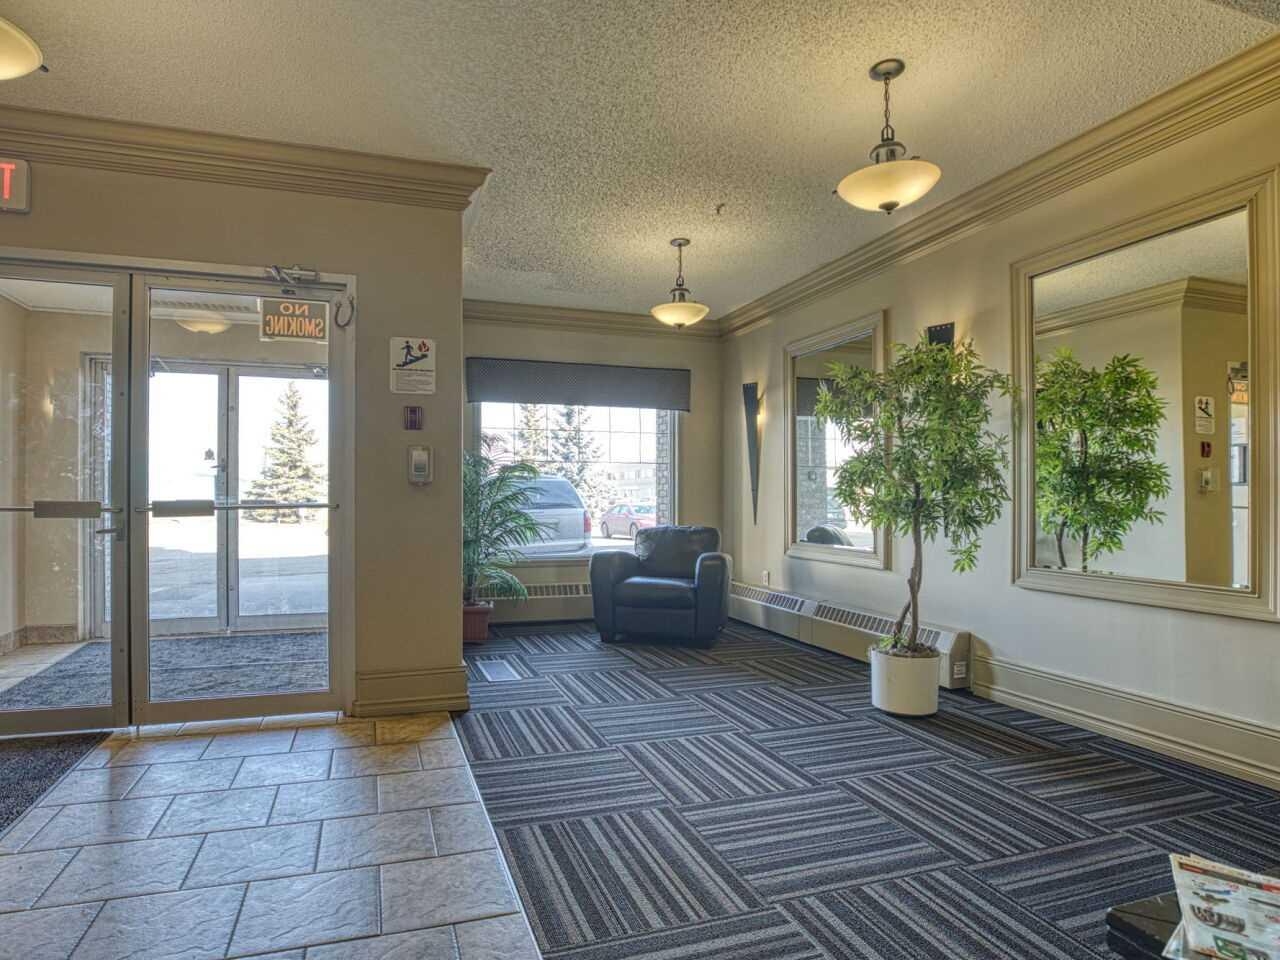 429 16807 100 Avenue - Glenwood_EDMO Lowrise Apartment for sale, 2 Bedrooms (E4234341) #3